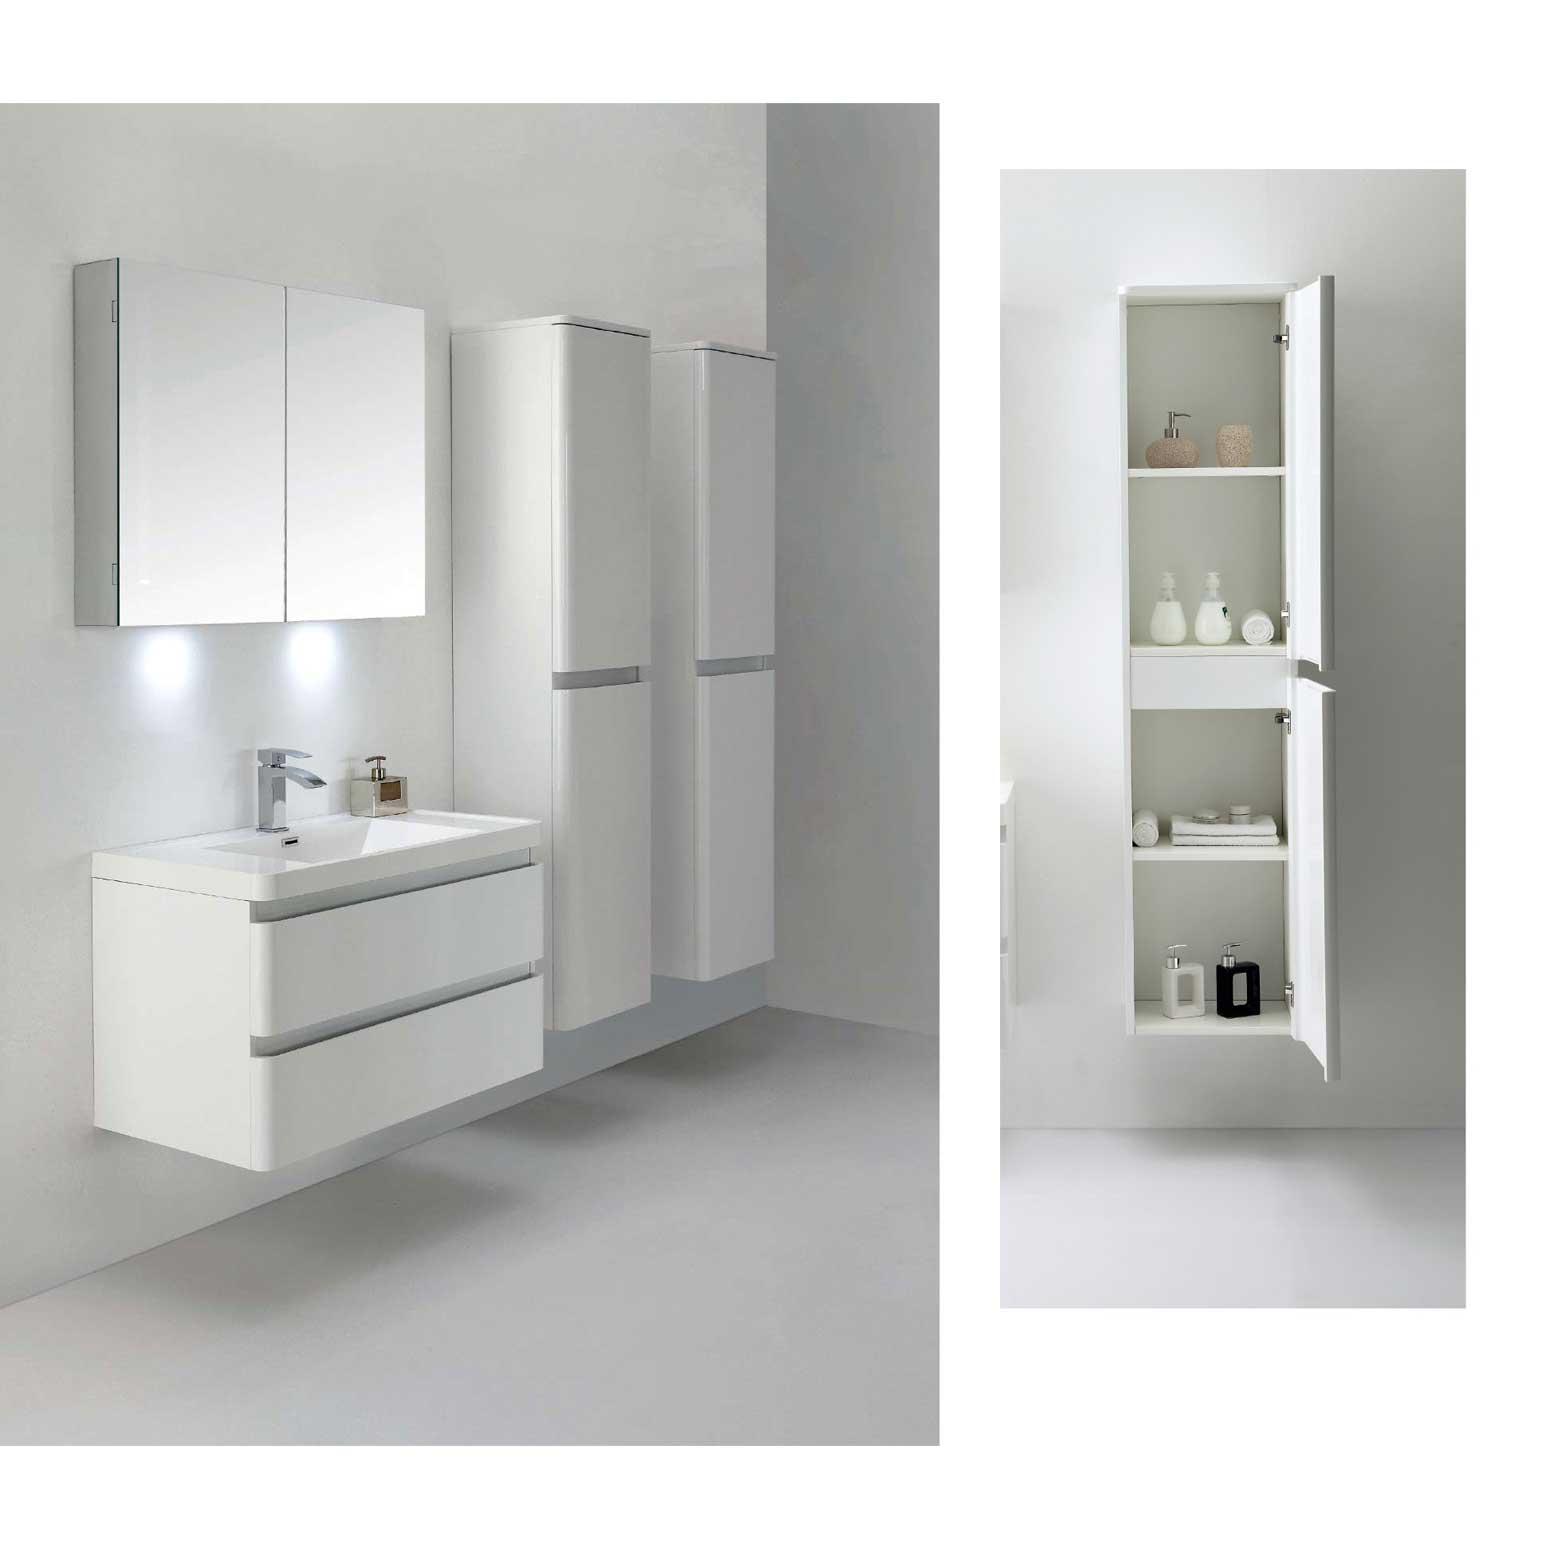 Amaral 355 WallMount Bathroom Vanity High Glossy White